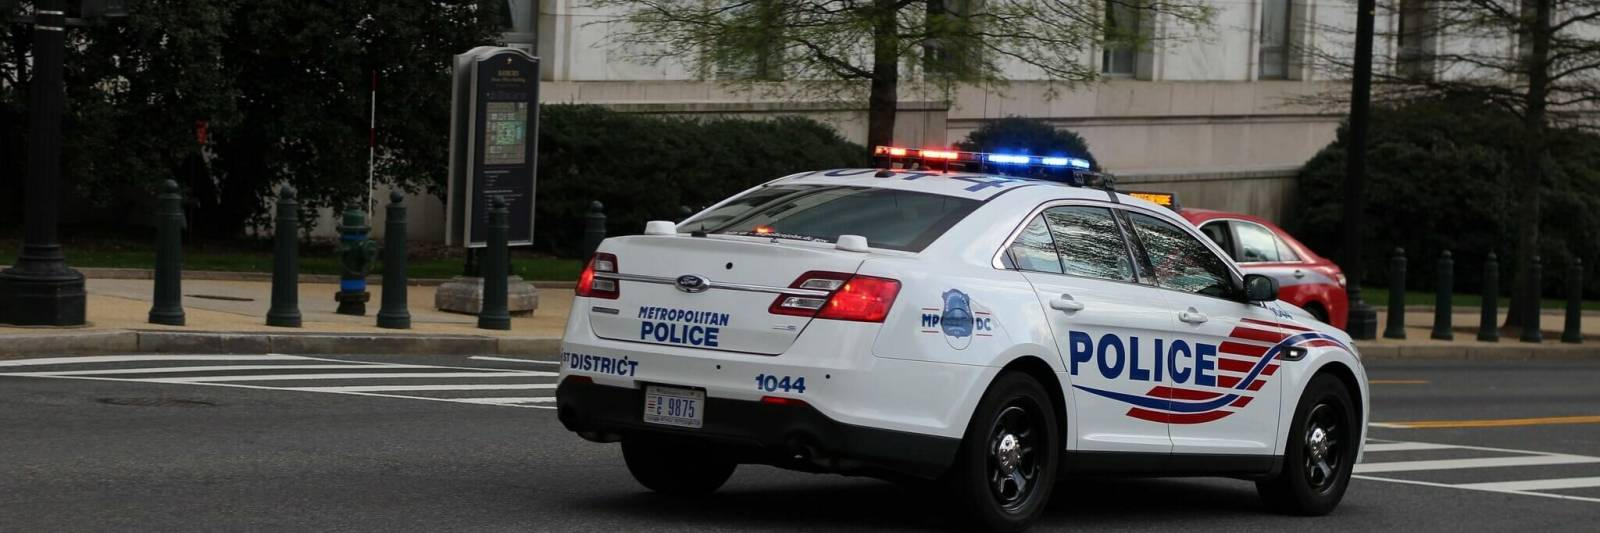 ransomware gang babuk claims dc's metropolitan police was last caper